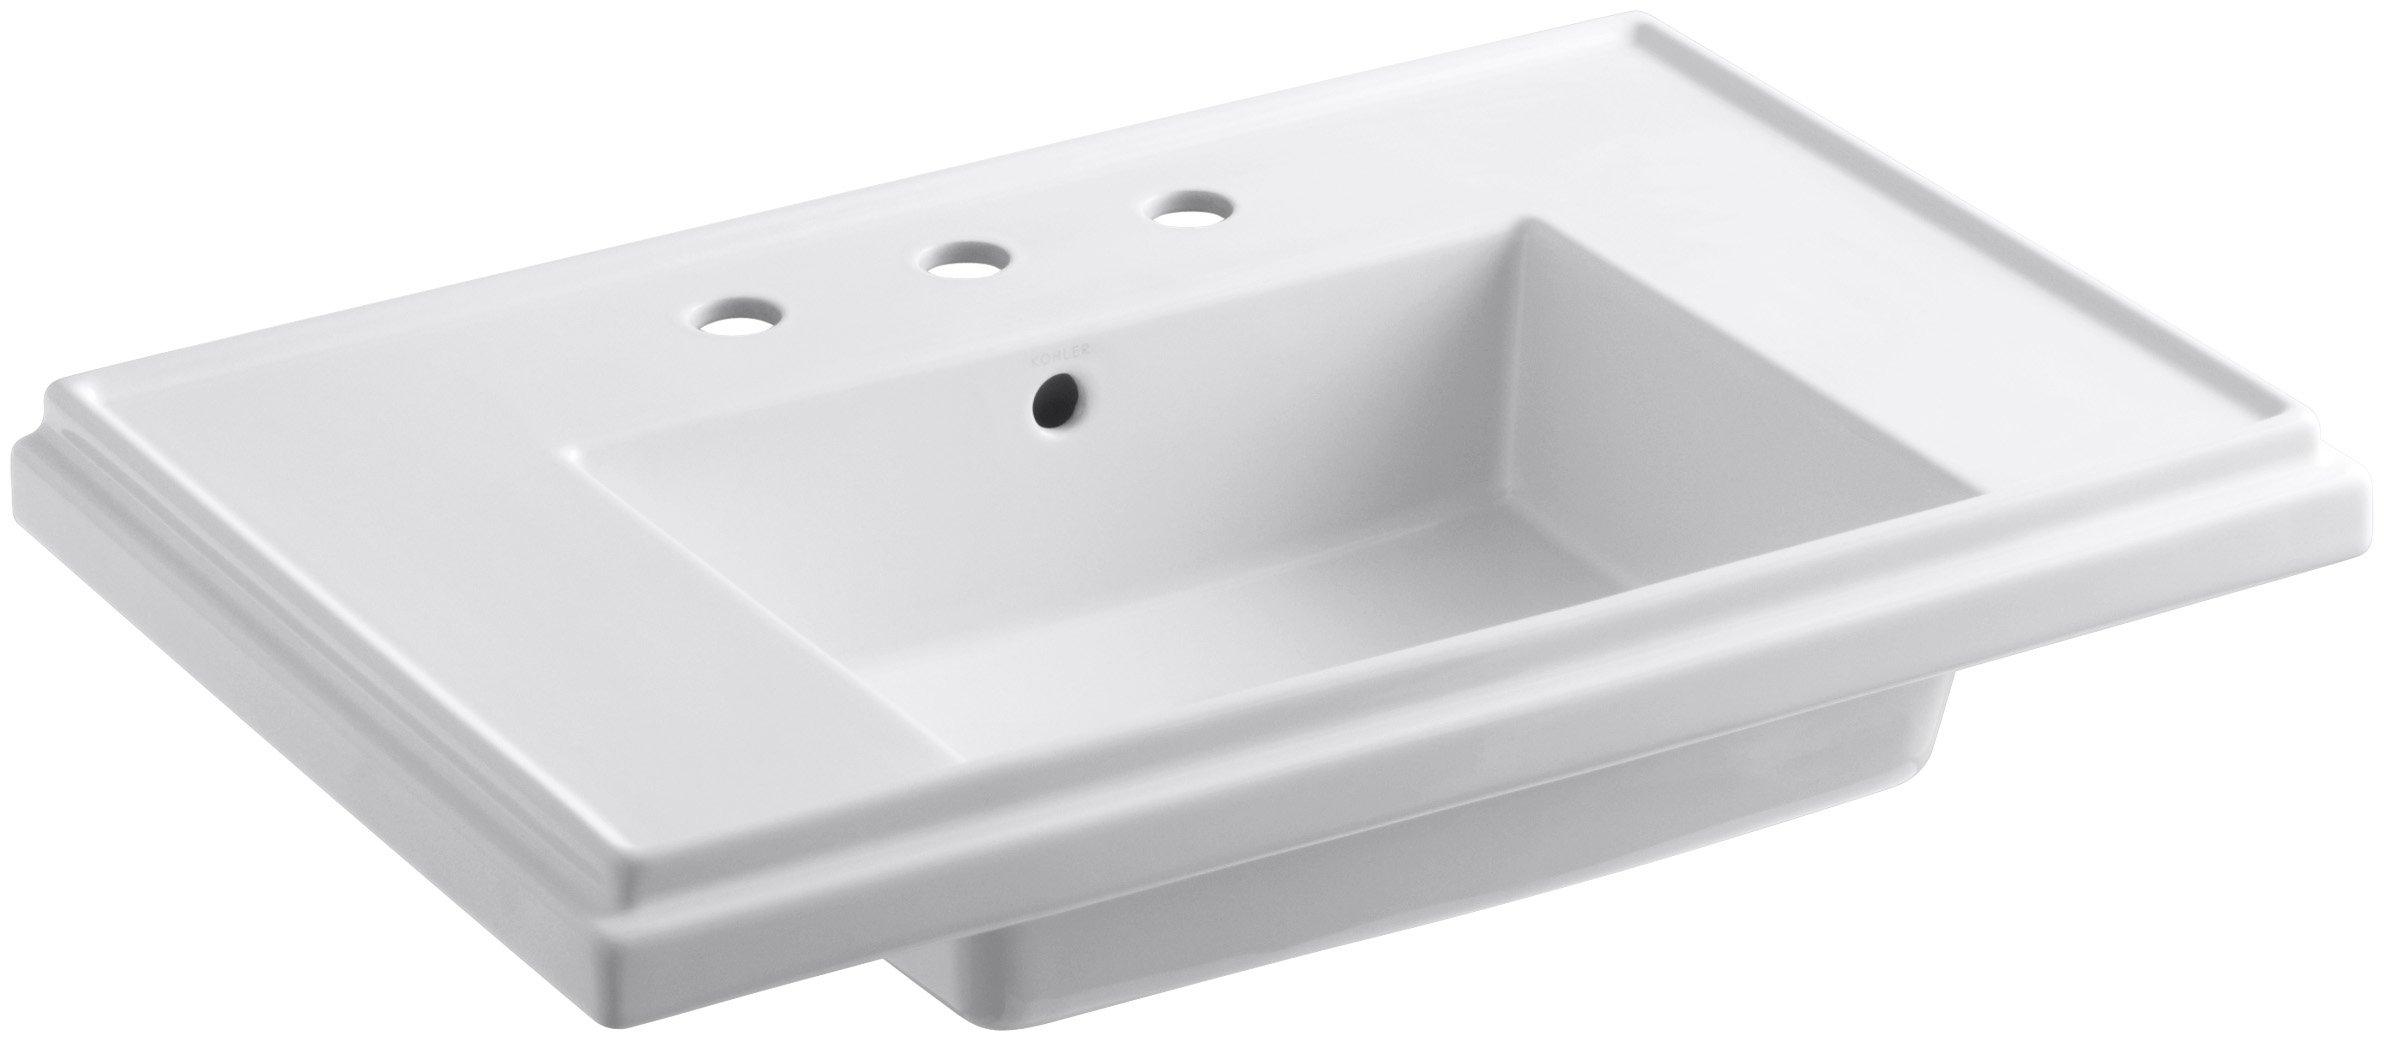 KOHLER K-2758-8-0 Tresham 30-Inch Pedestal Bathroom Sink